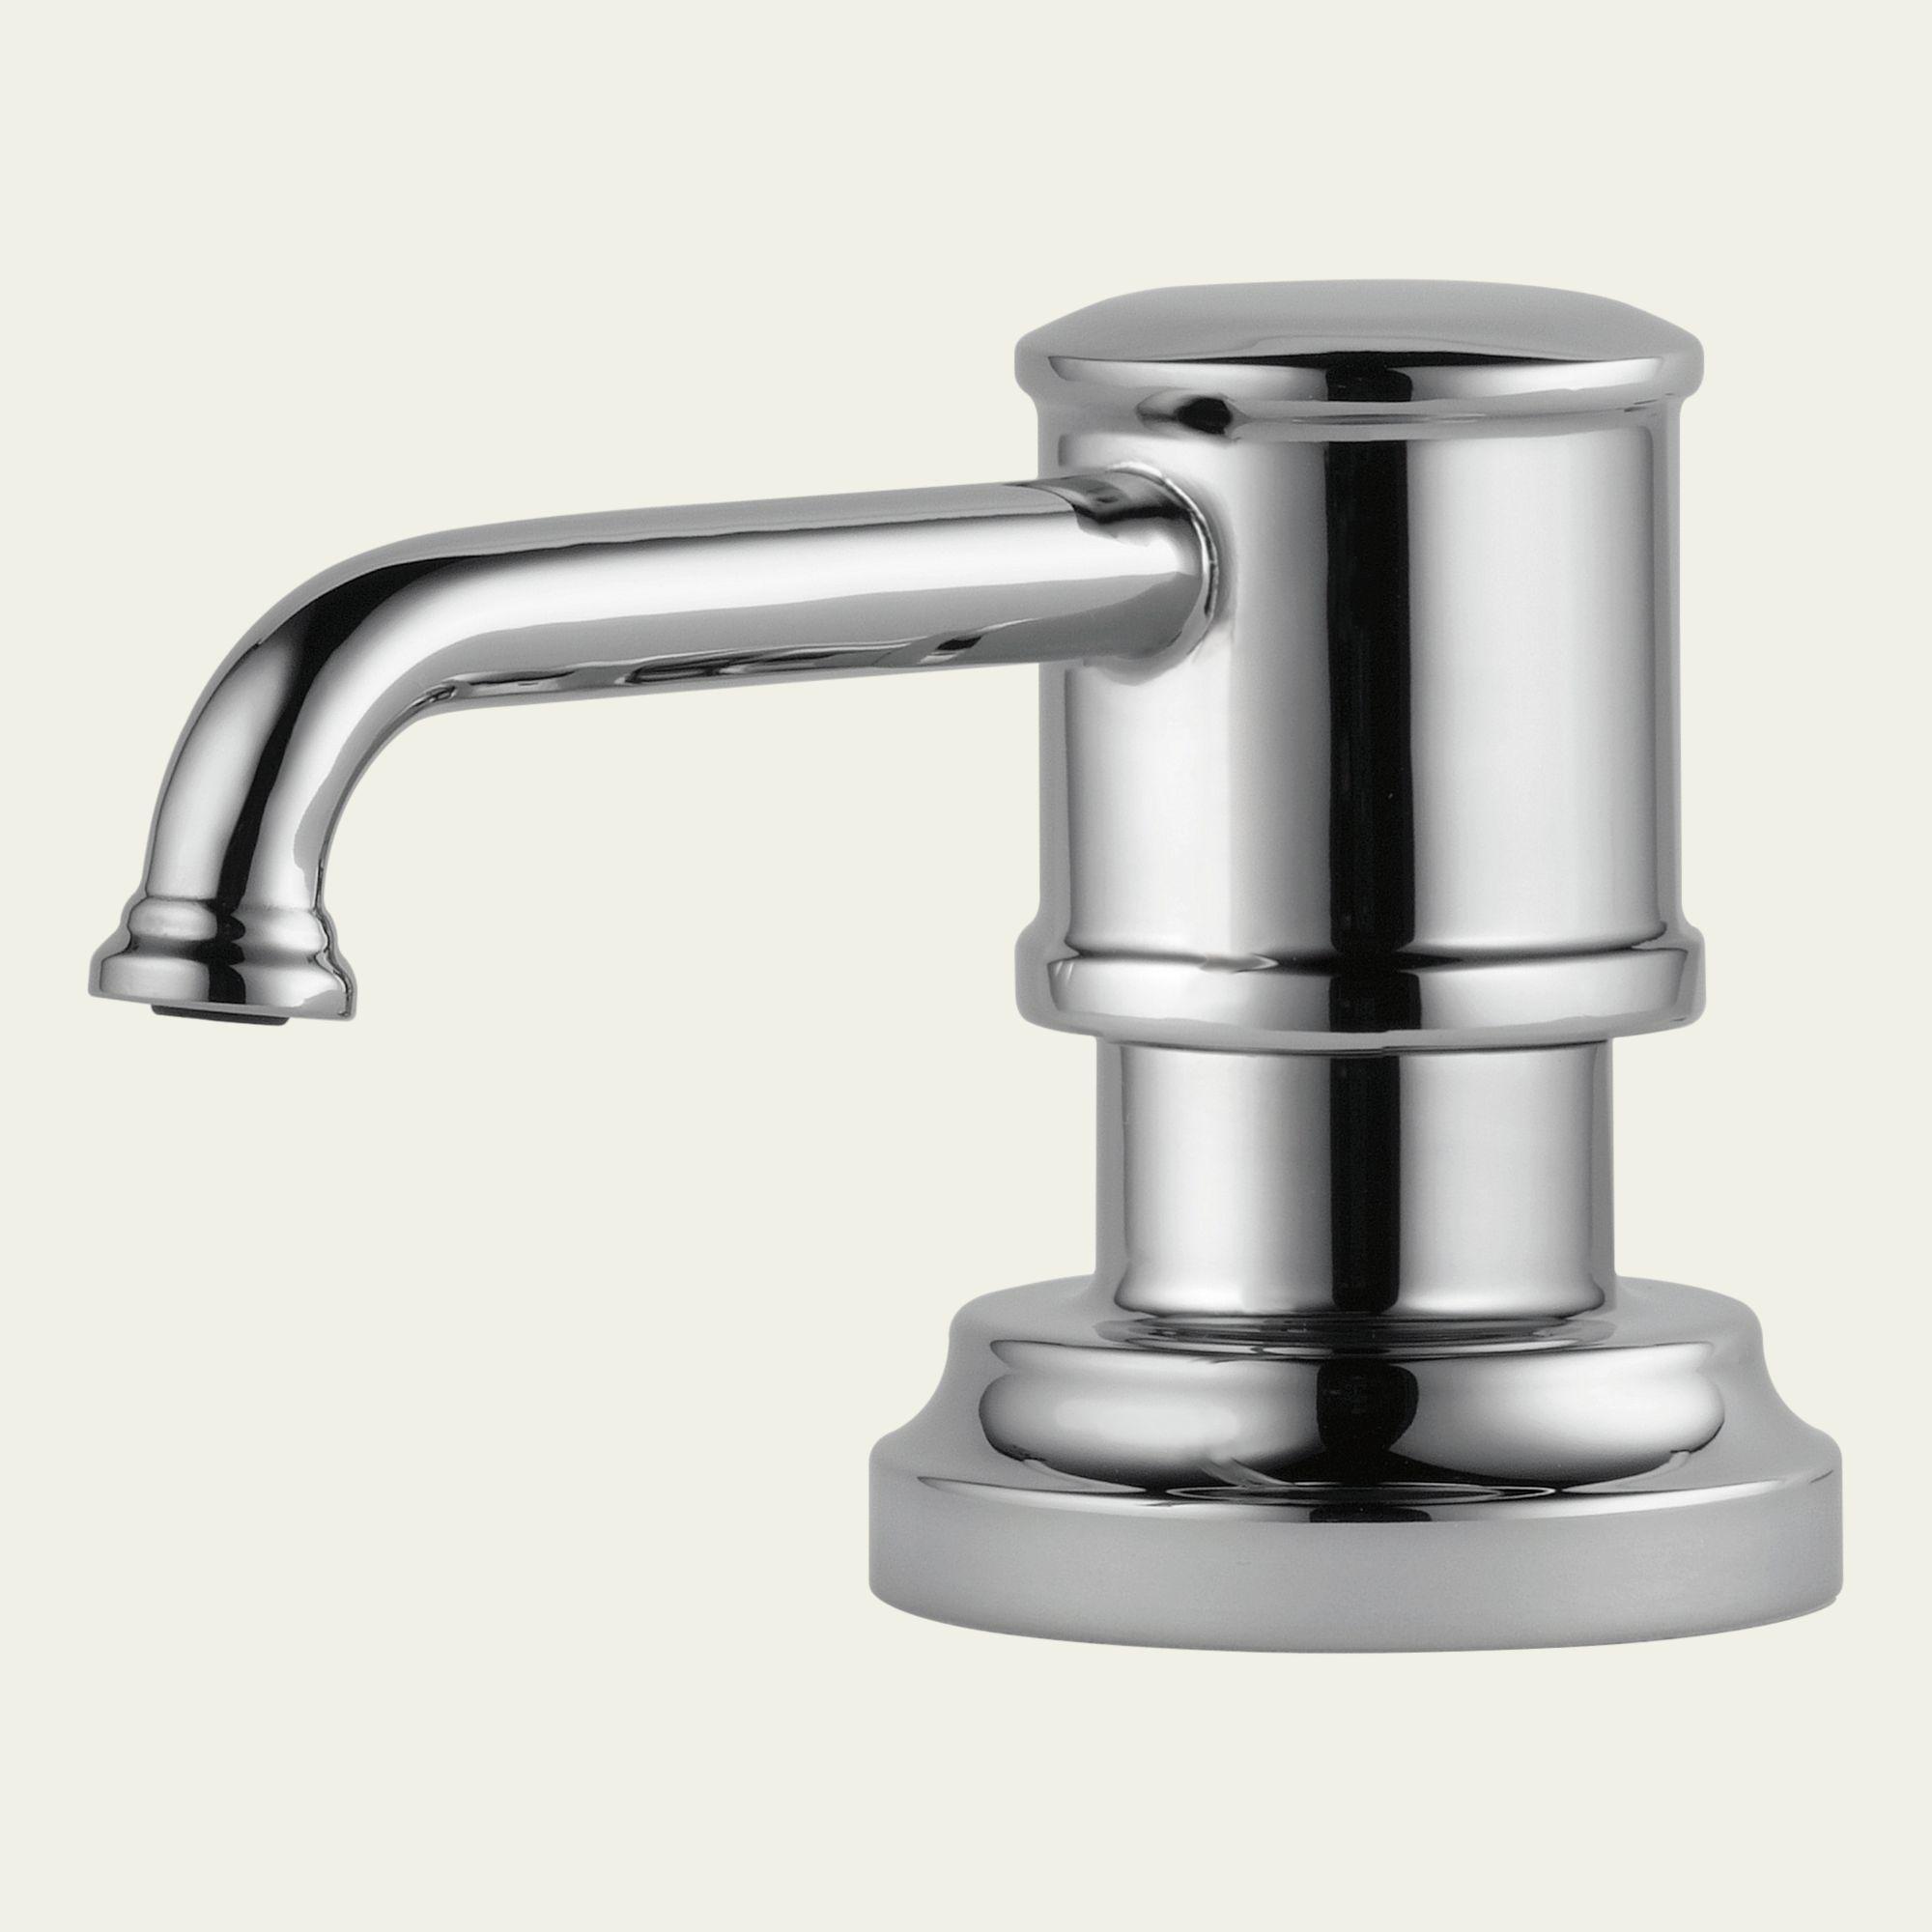 64025LF Brizo Single Handle PullDown Kitchen Faucet with